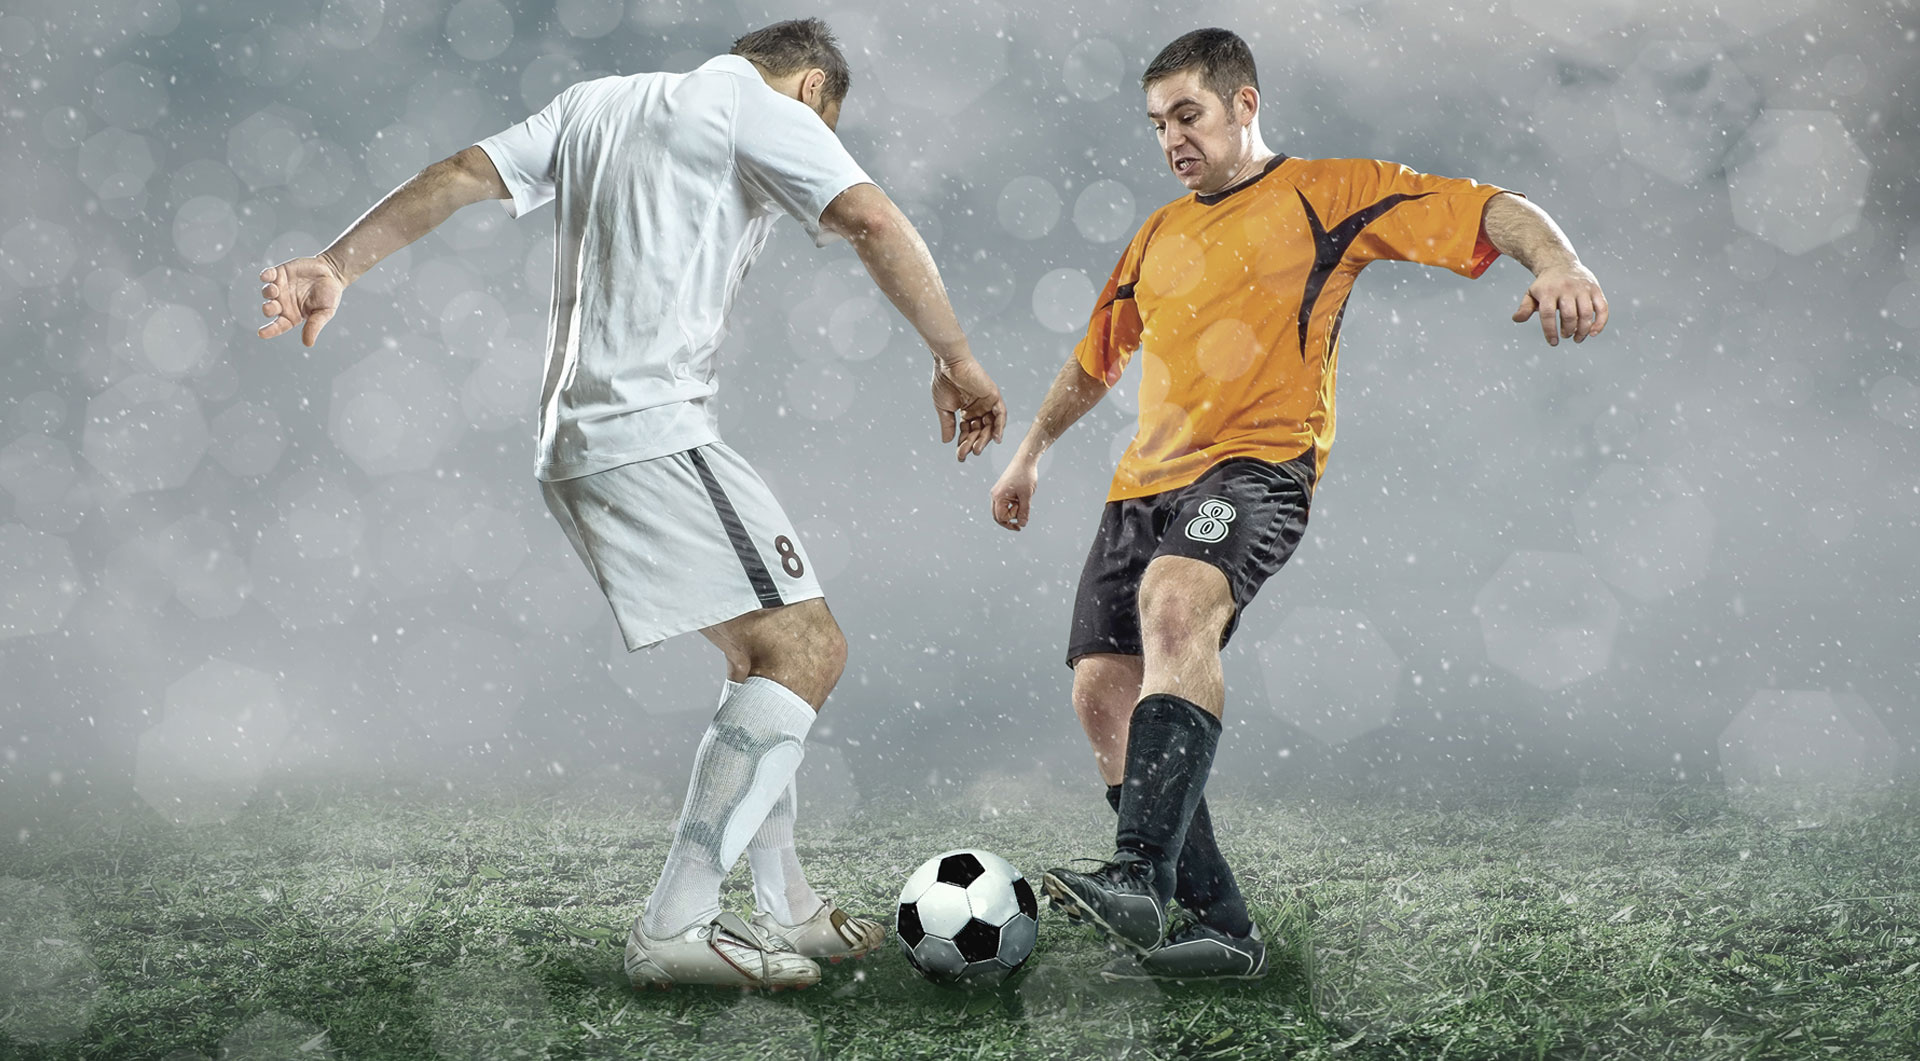 watch-stan-wawrinka-vs-tommy-robredo-4th-round-2014-live